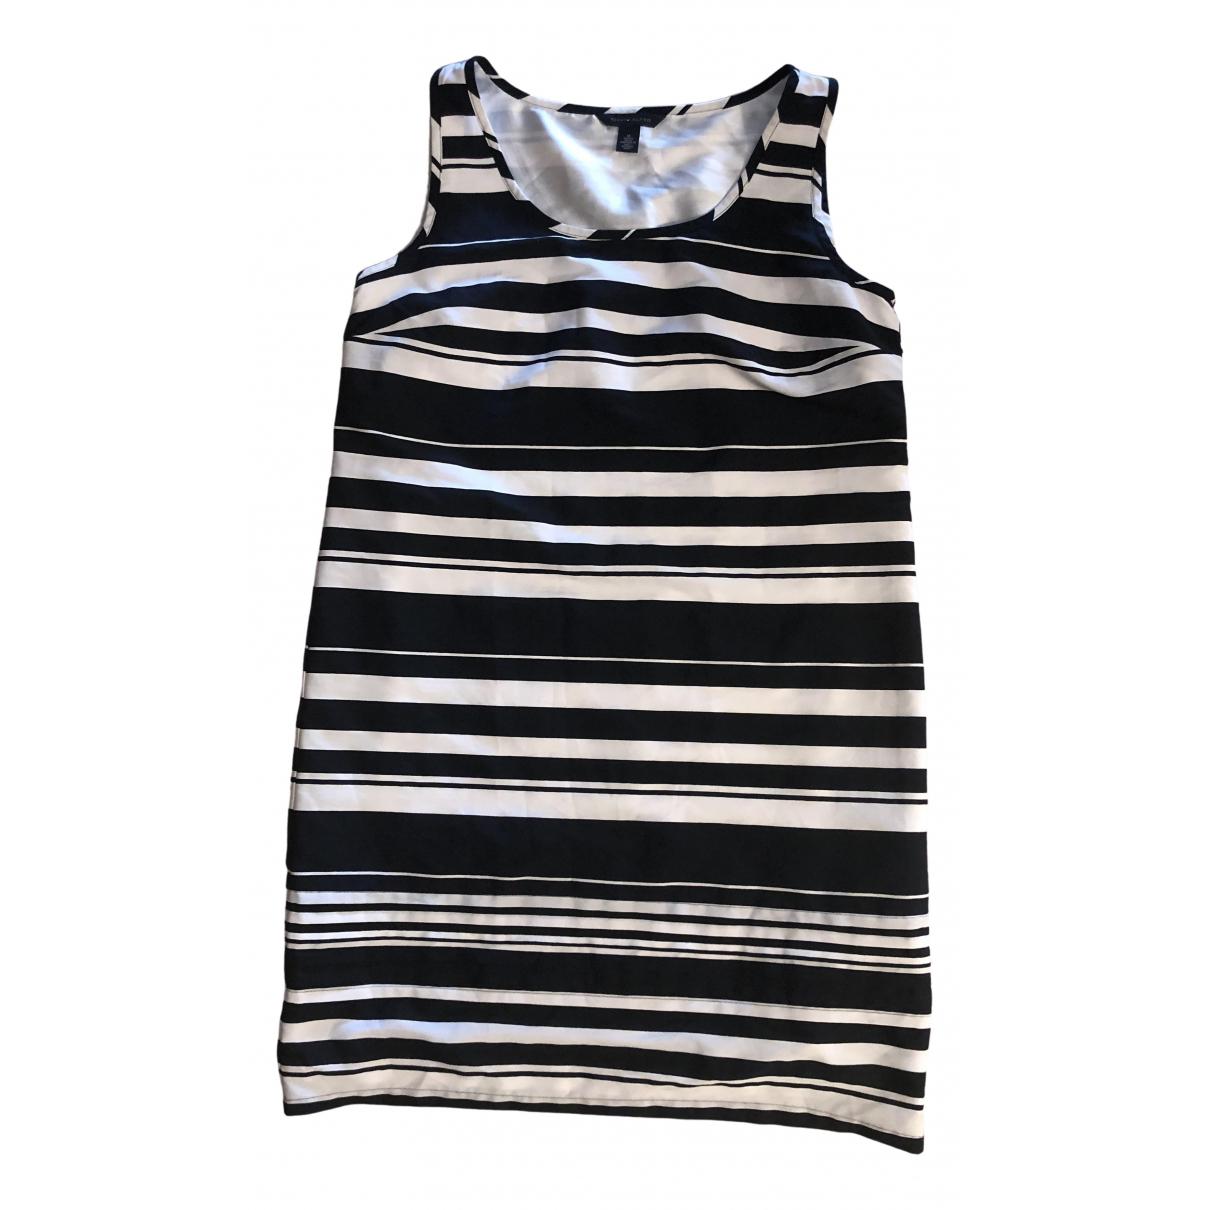 Tommy Hilfiger \N Blue dress for Women M International